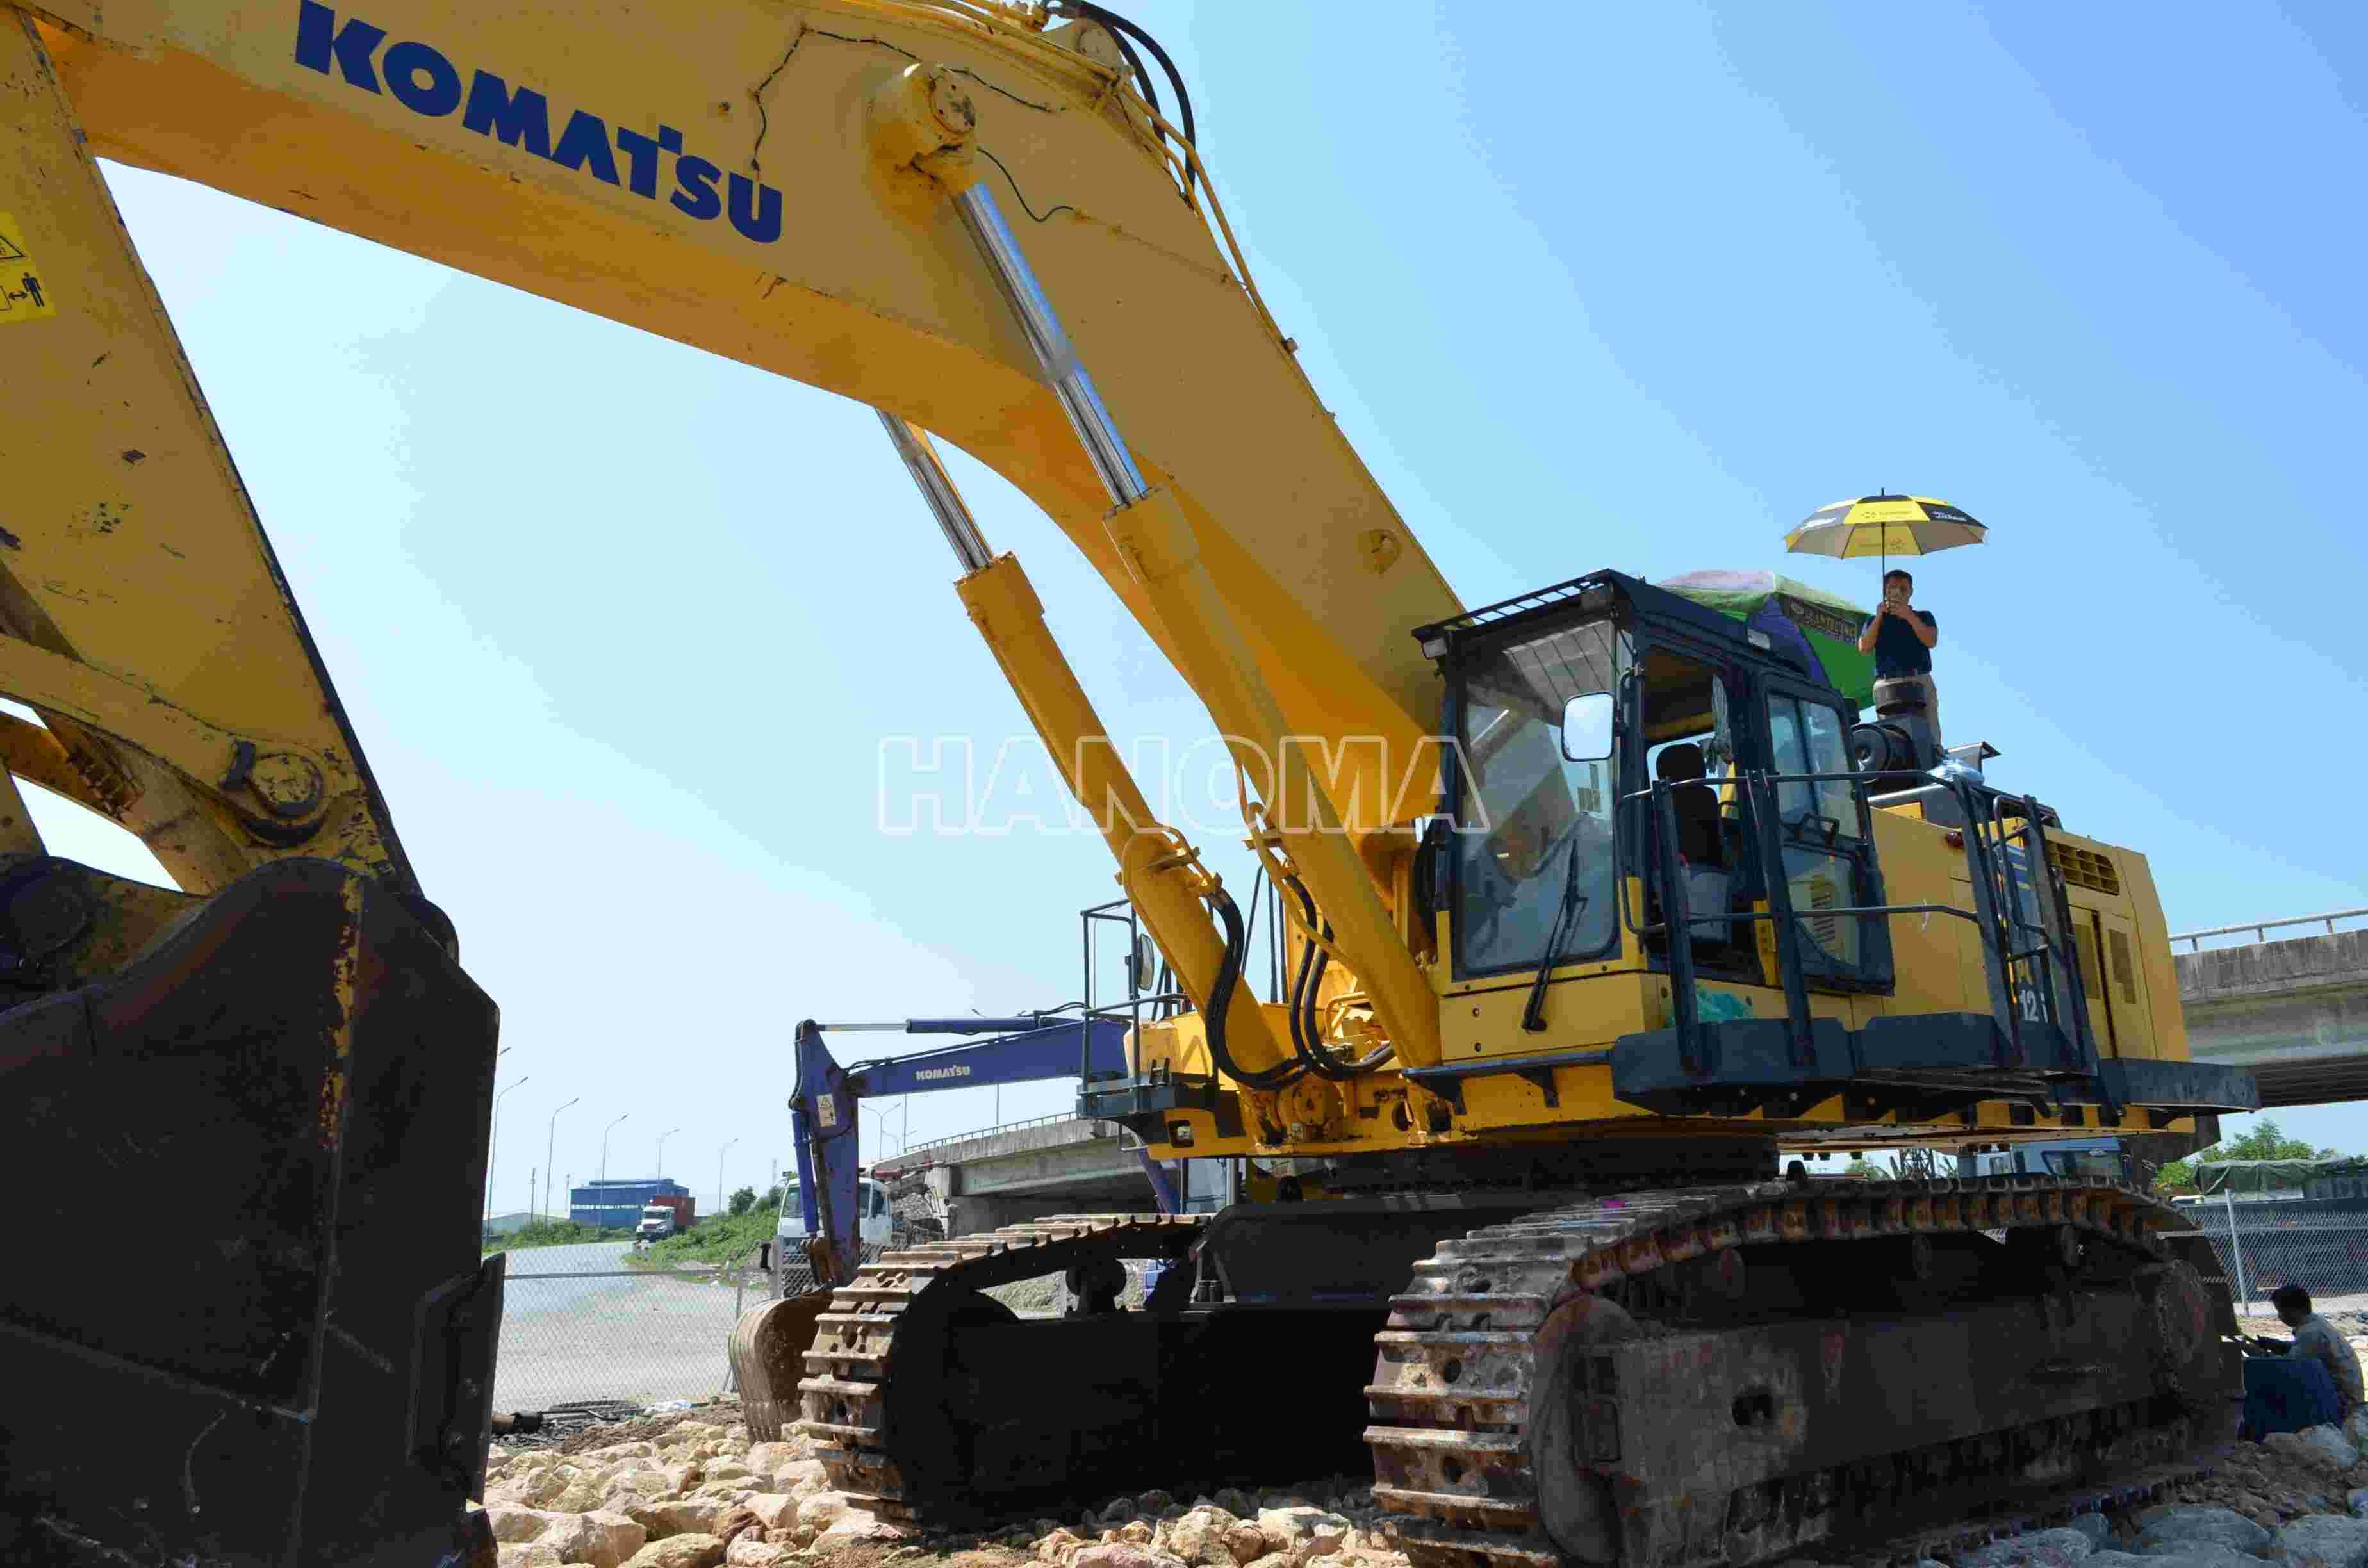 Bán máy xúc đào KOMATSU PC1250SP-8R 2019